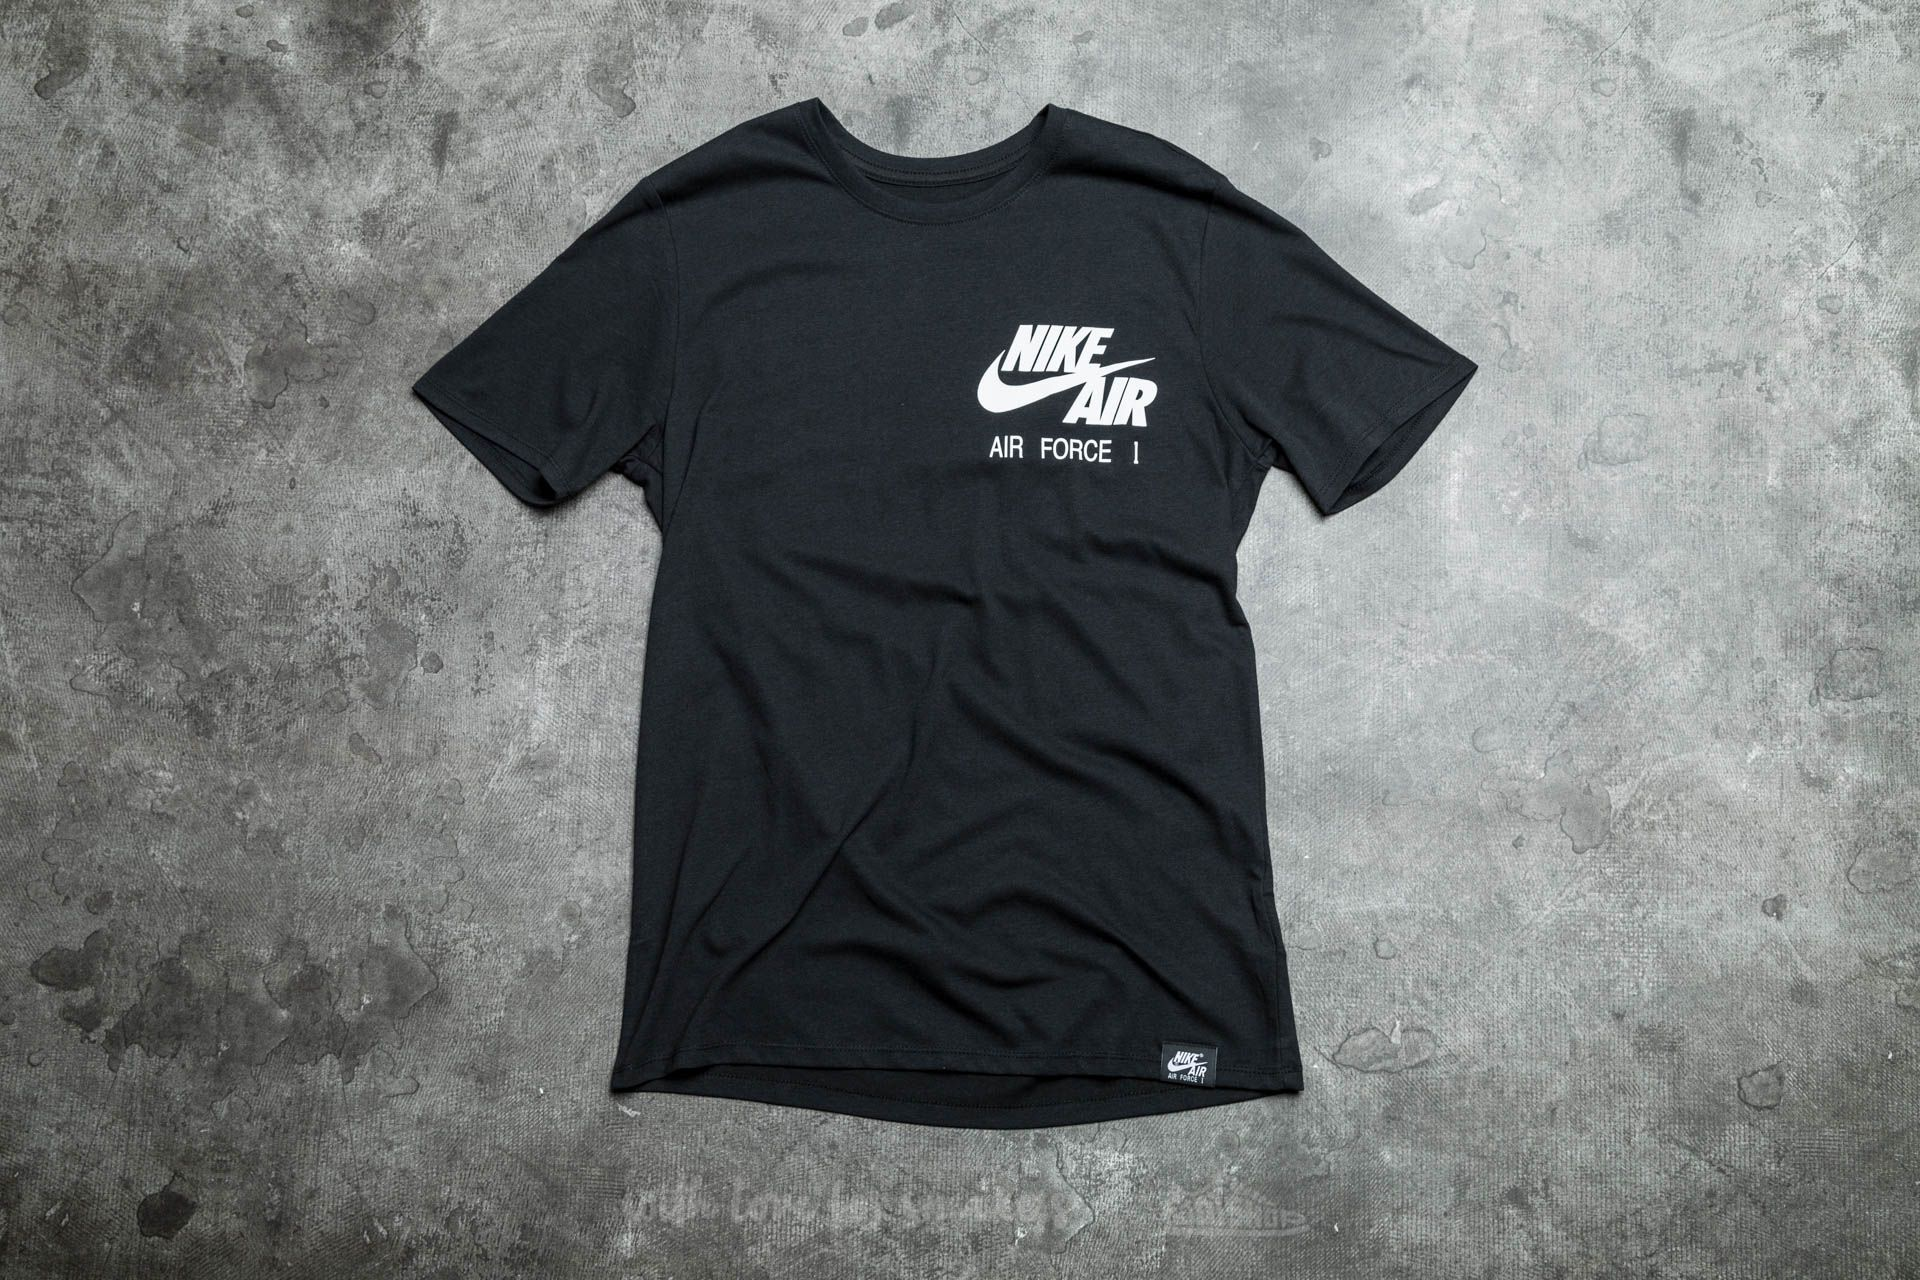 Force Tee Finest 1 WhiteFootshop Sportswear Nike Air Uptown's Black OkwPZXiuT